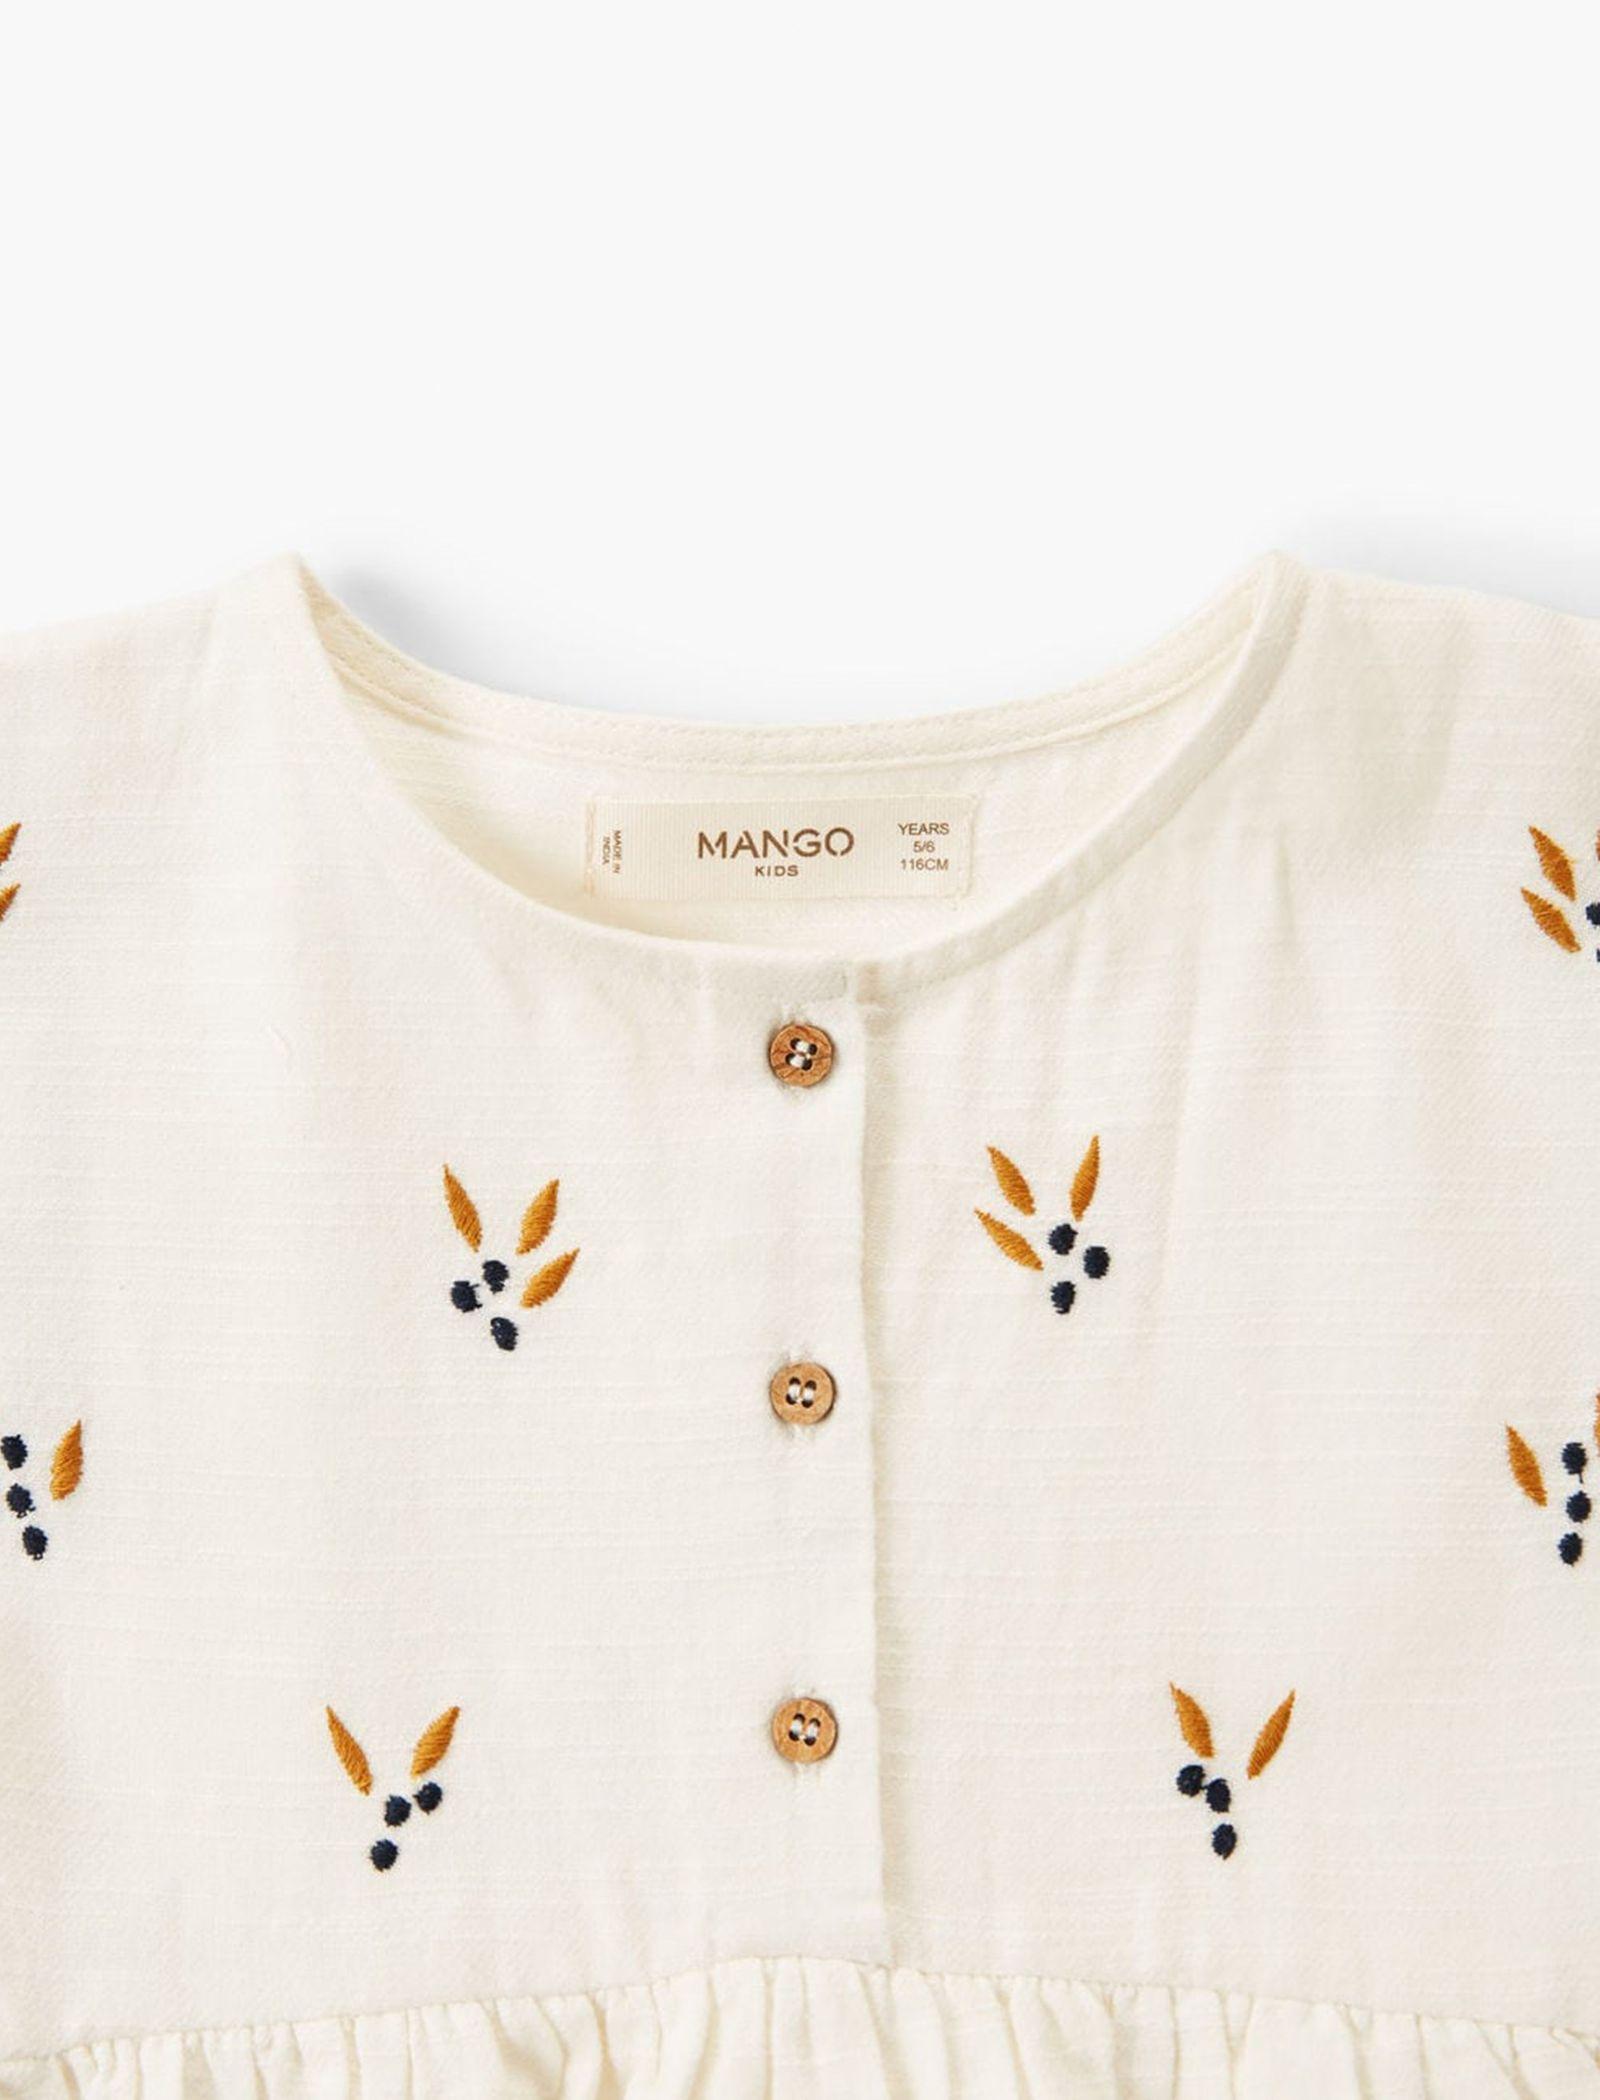 پیراهن نخی روزمره دخترانه - مانگو - سفيد - 3